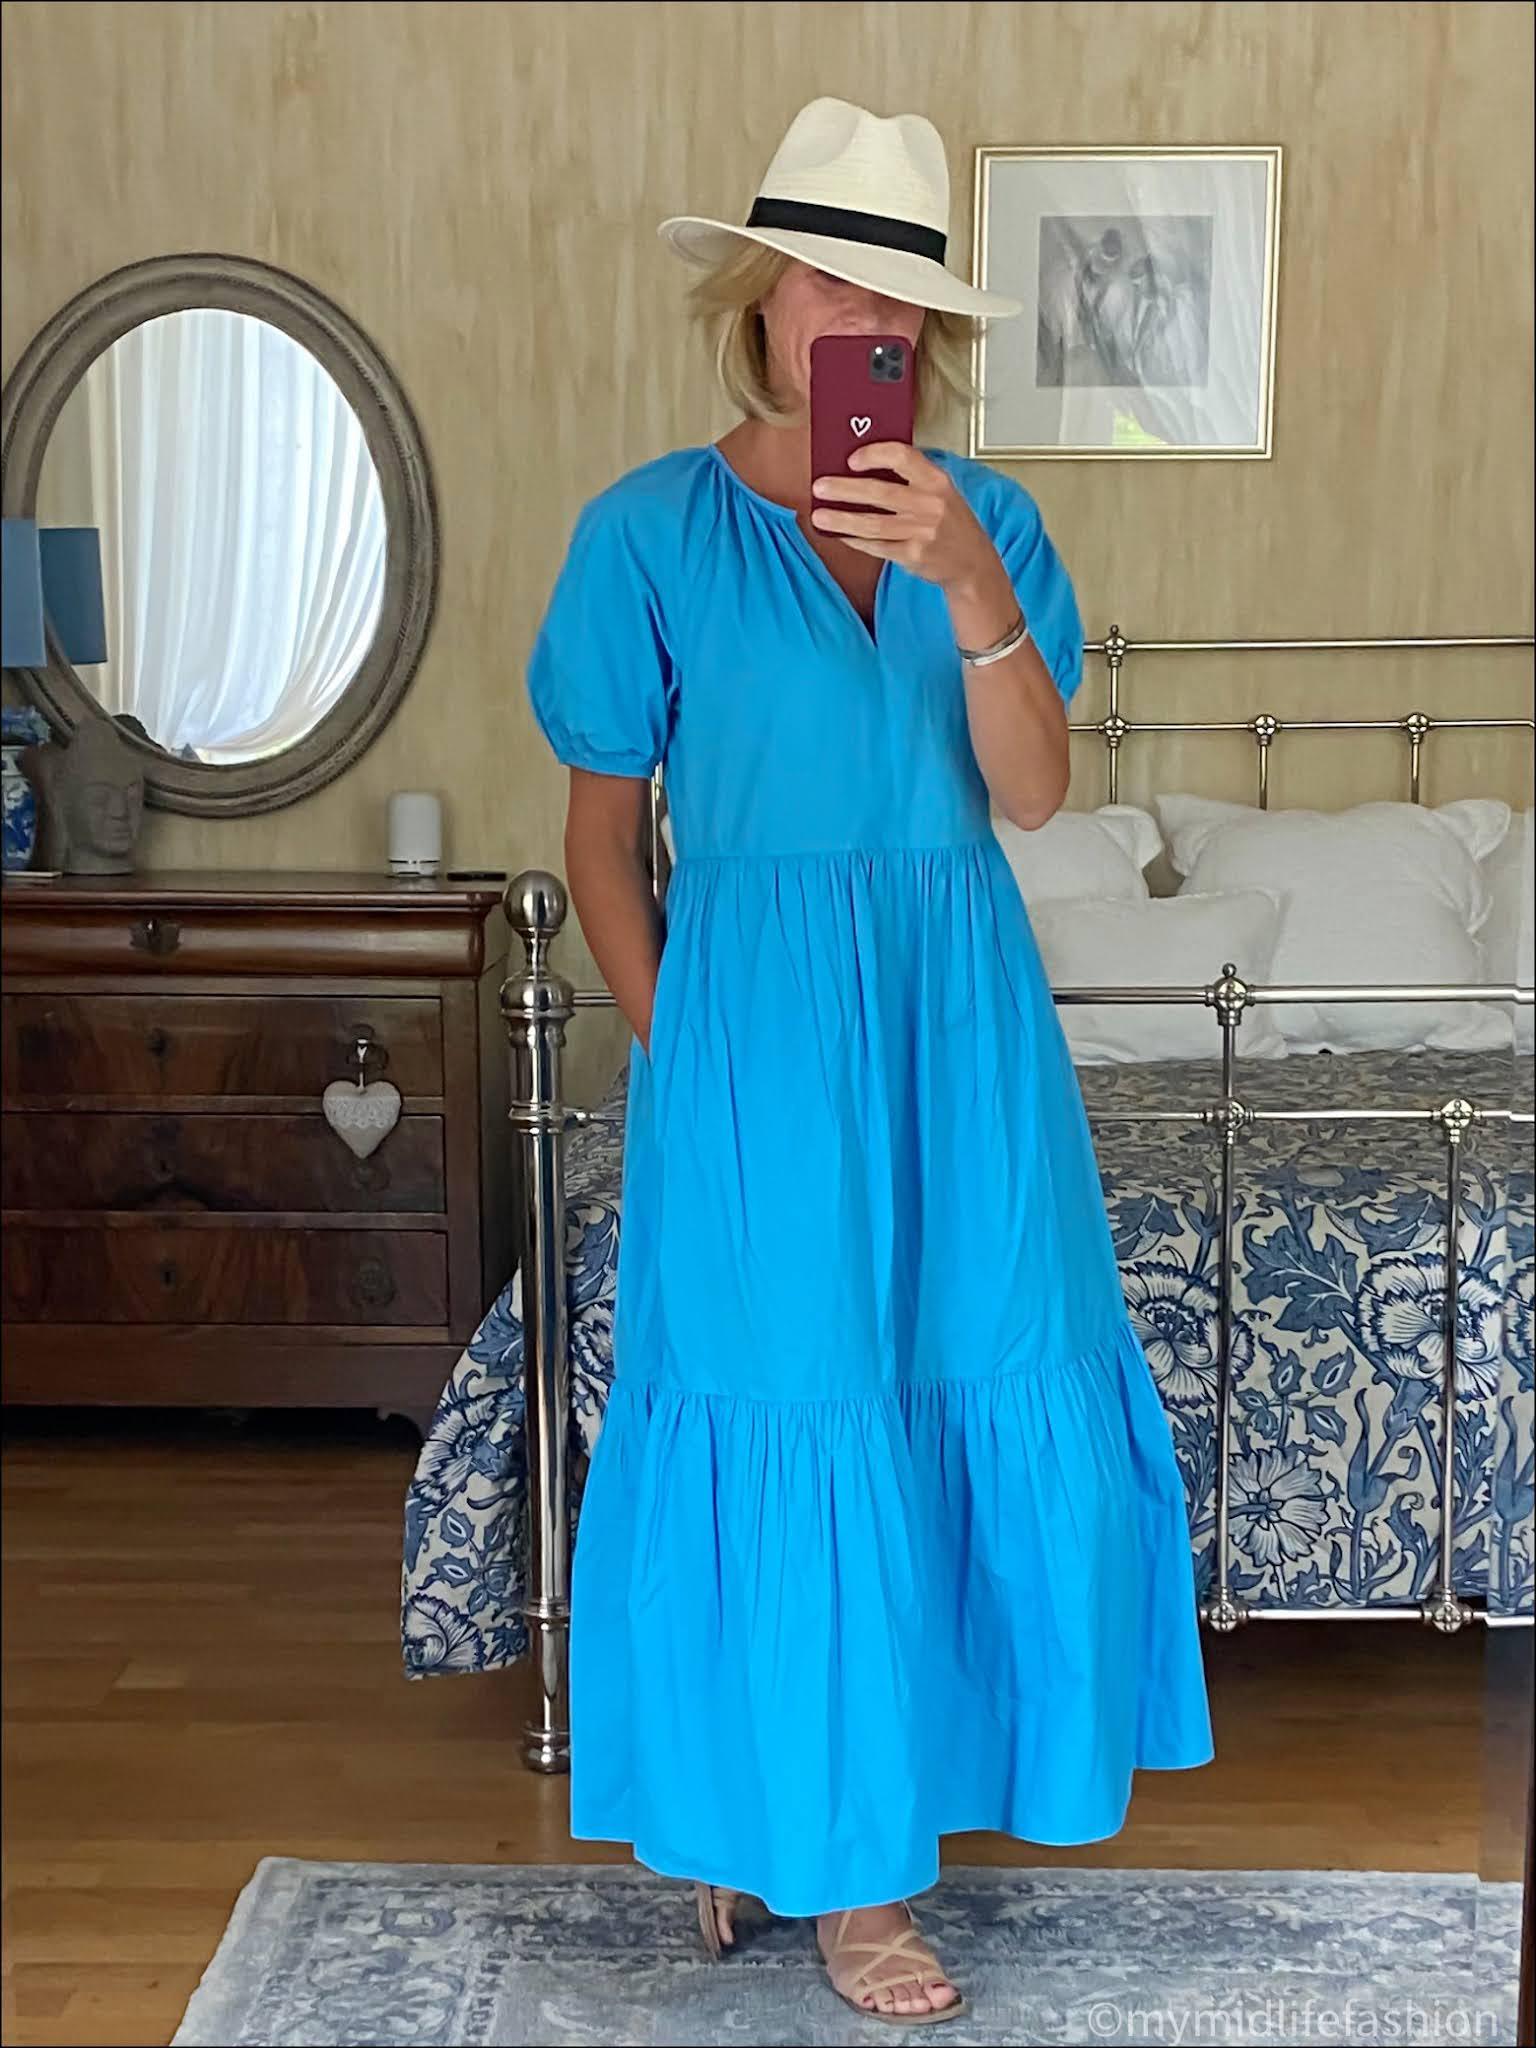 my midlife fashion, Zara Panama hat, Ancient Greek leather wrap around sandals, Great Plains crisp cotton tiered dress